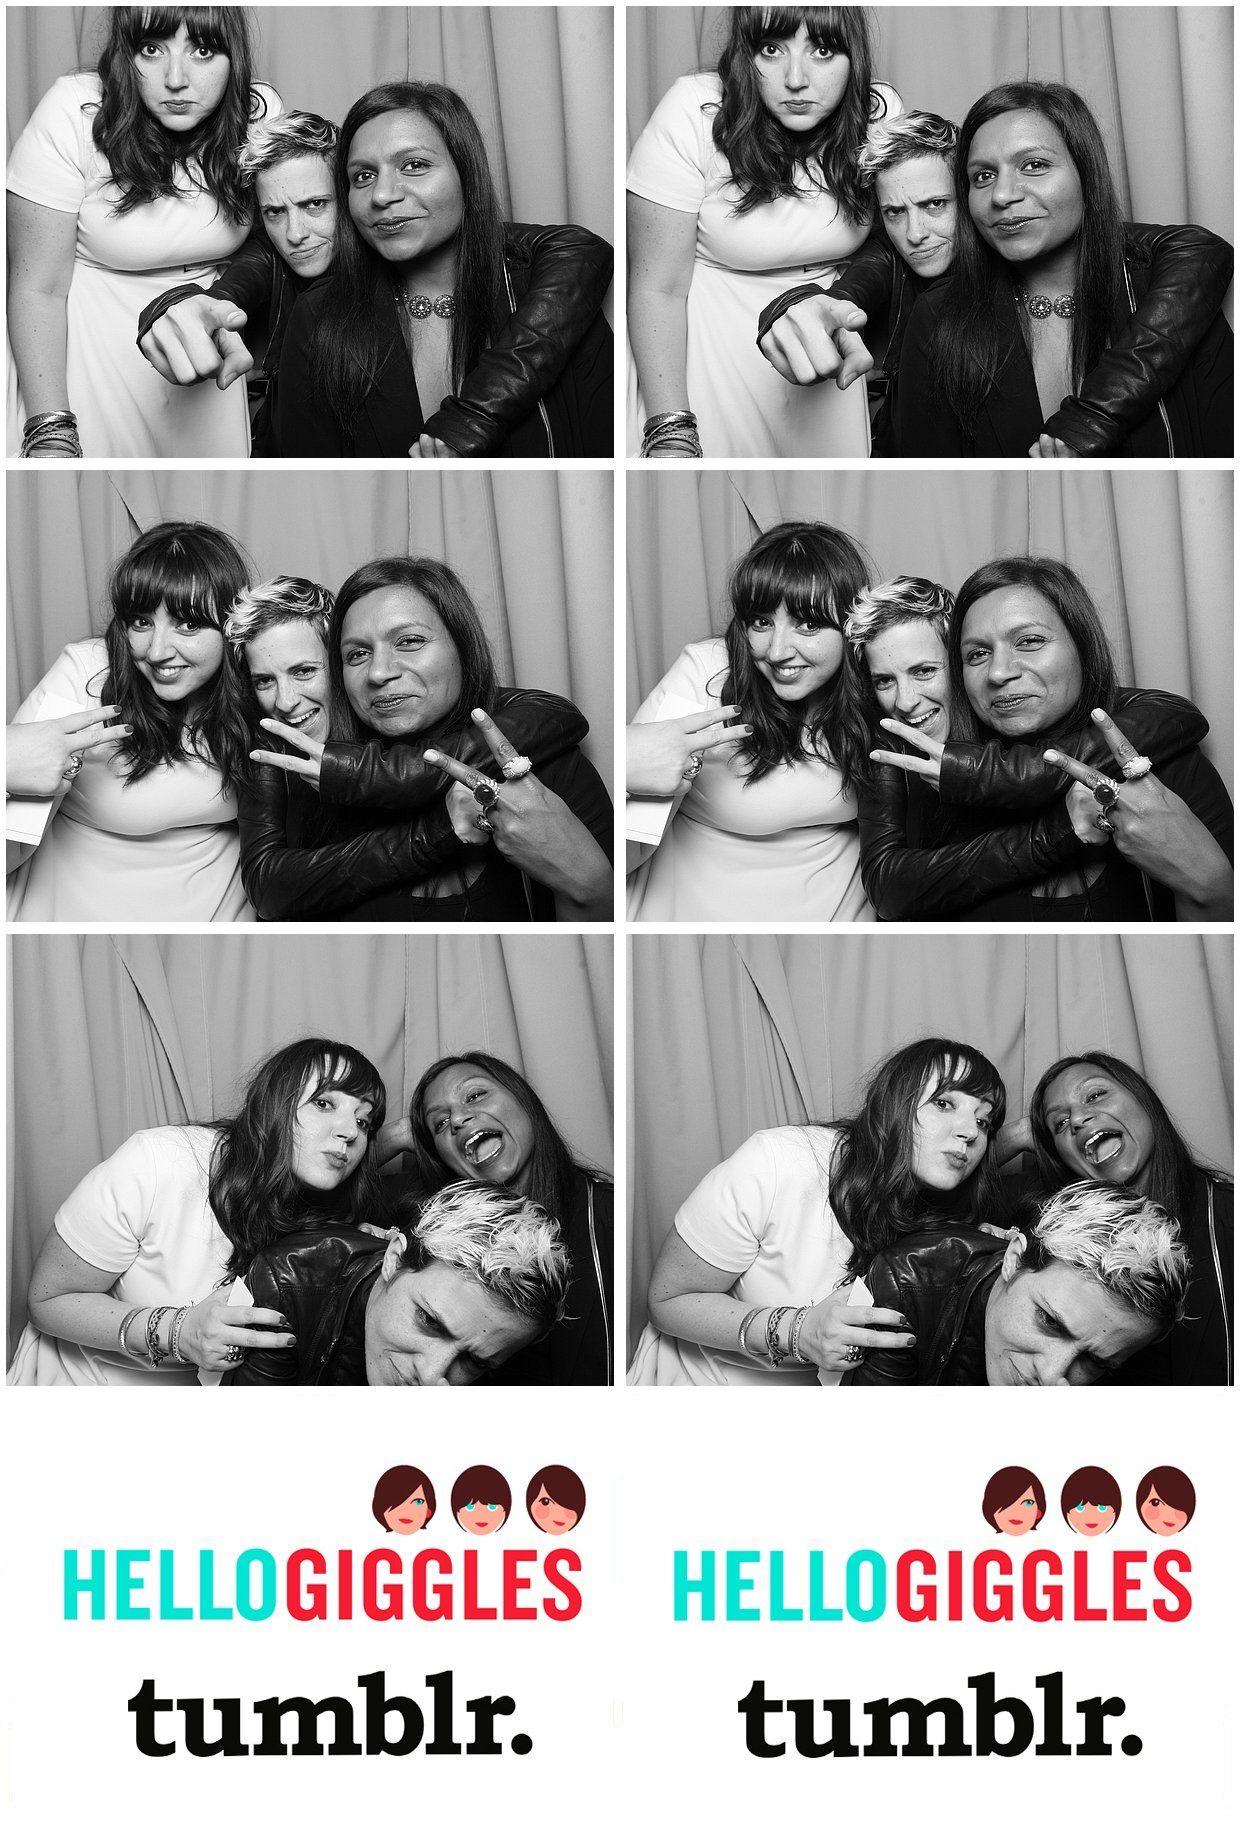 Celebrity Photo Booth! (8 pics) - My Modern Met